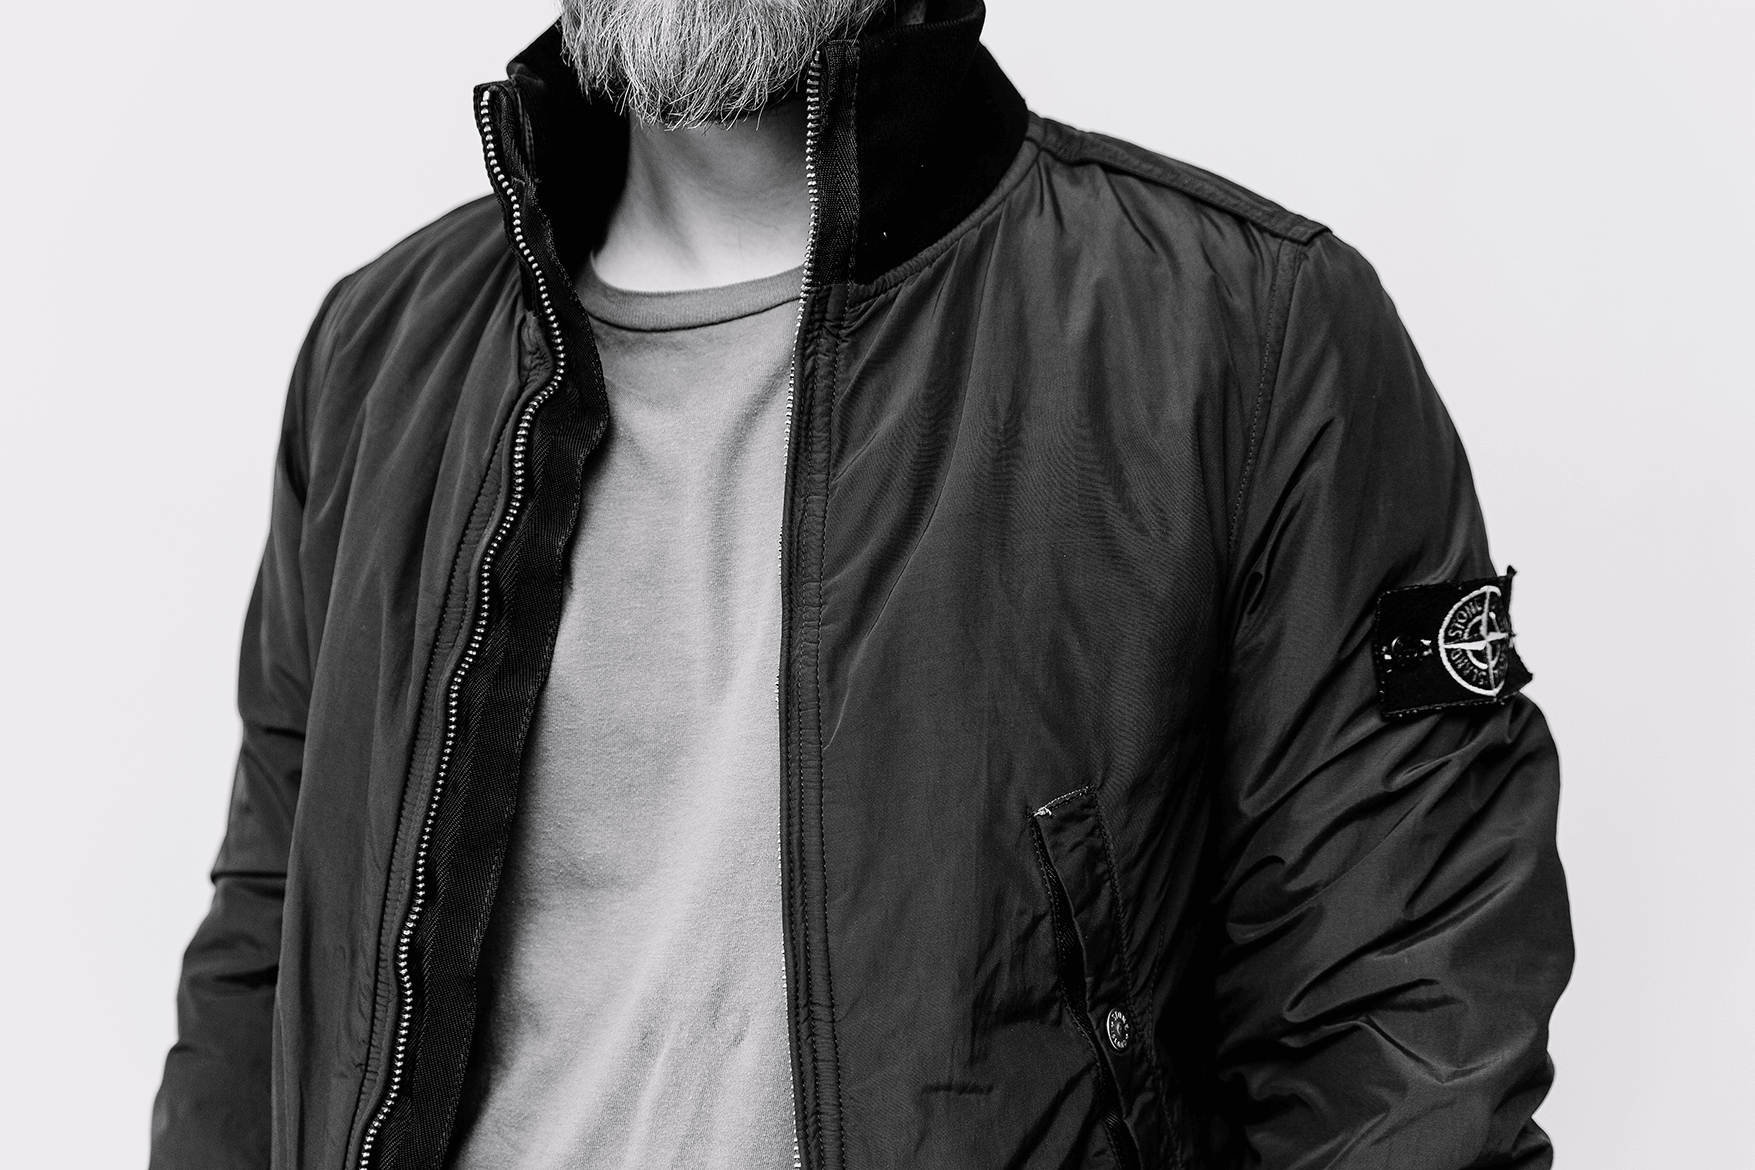 vyriska-apranga-originalus-dizaineriu-drabuziai-vyrams-7cproject